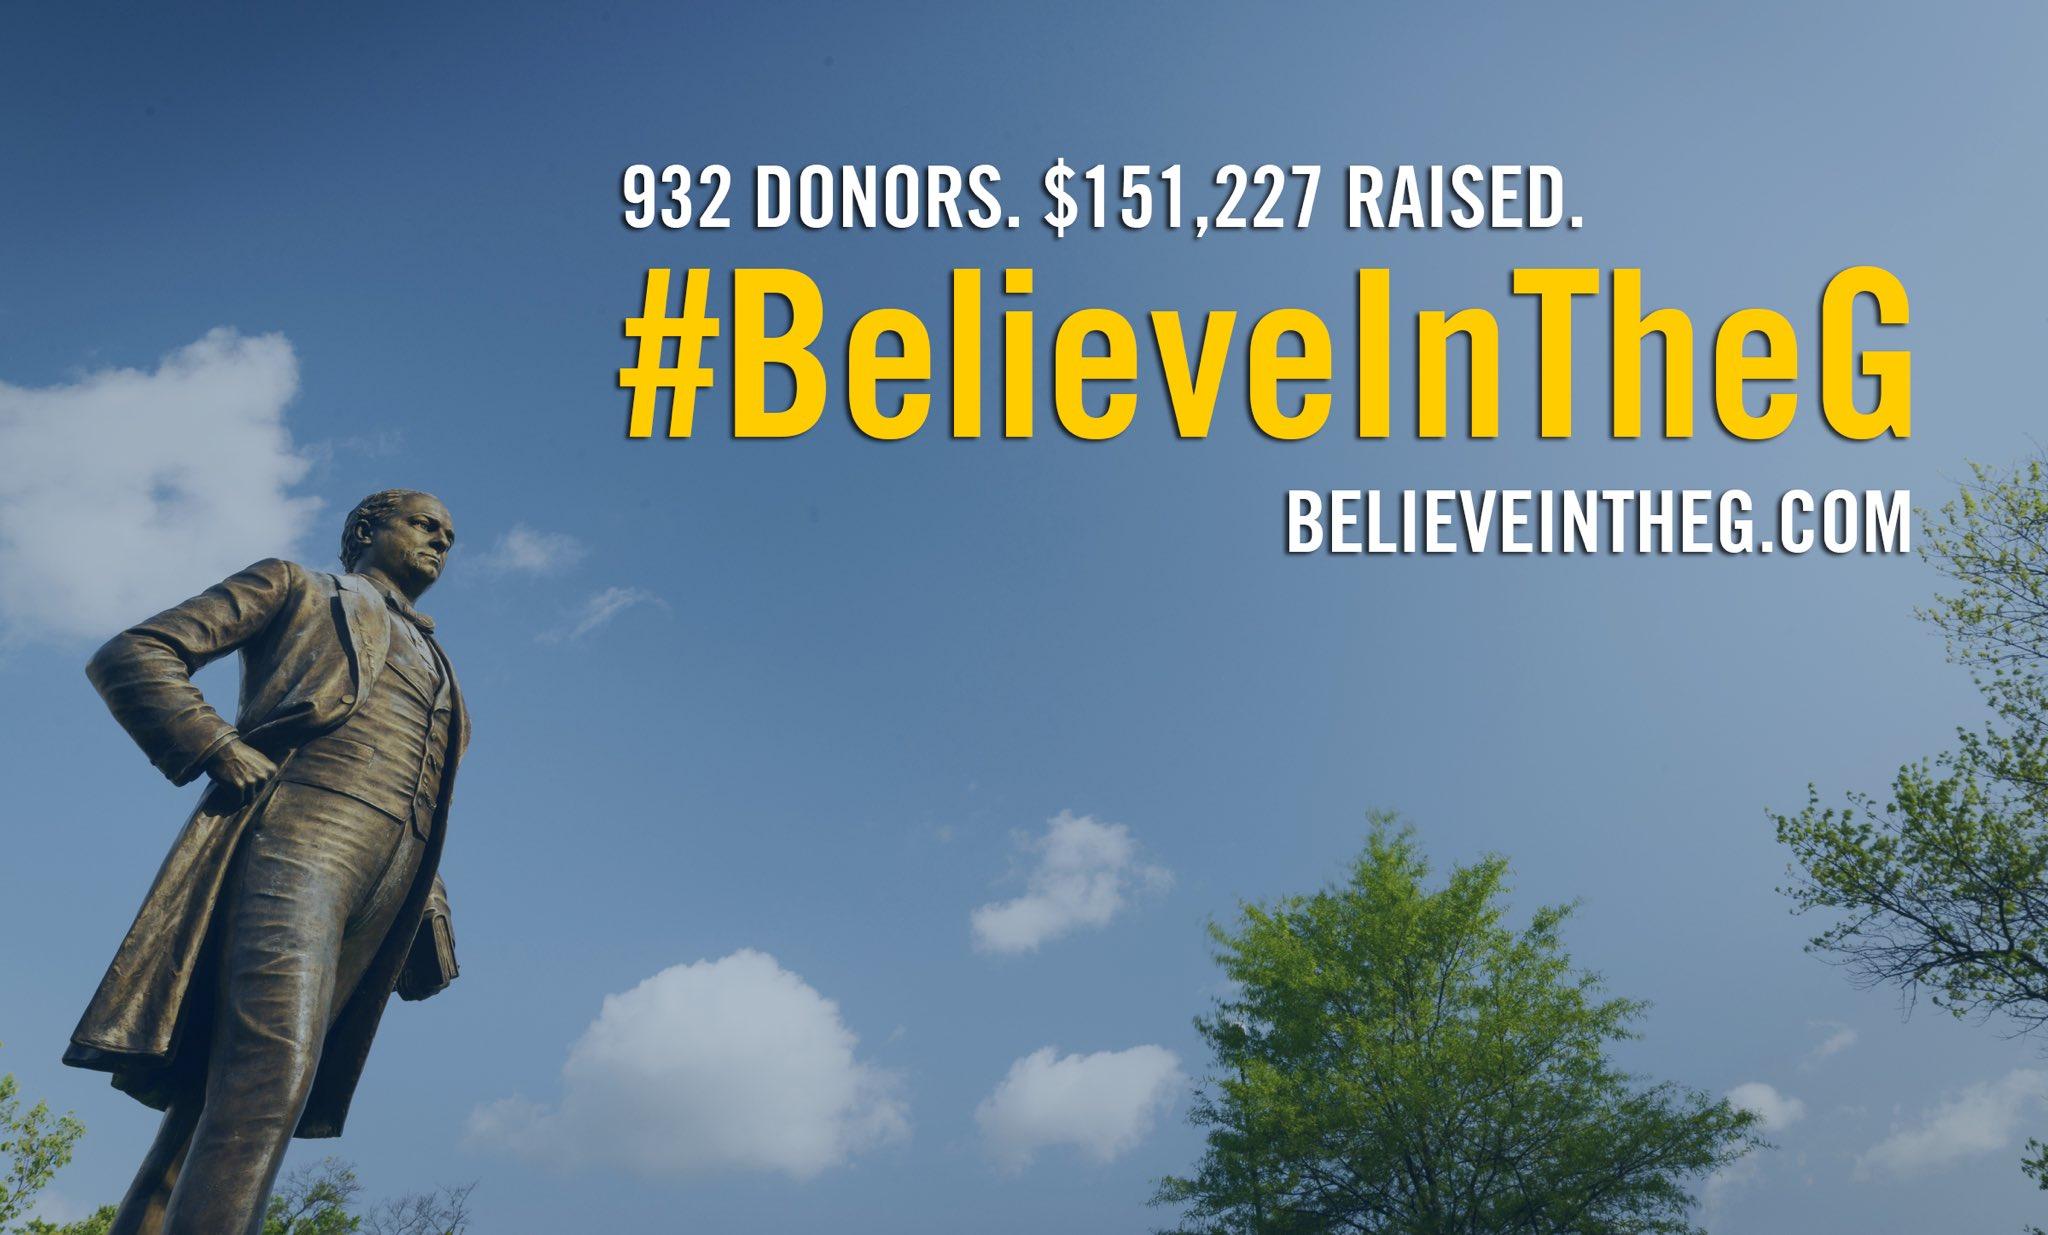 We did it! Third annual #BelieveInTheG campaign exceeds expectations. 💙💛 https://t.co/TTH8C808No #dsba https://t.co/3KIWZUp1La